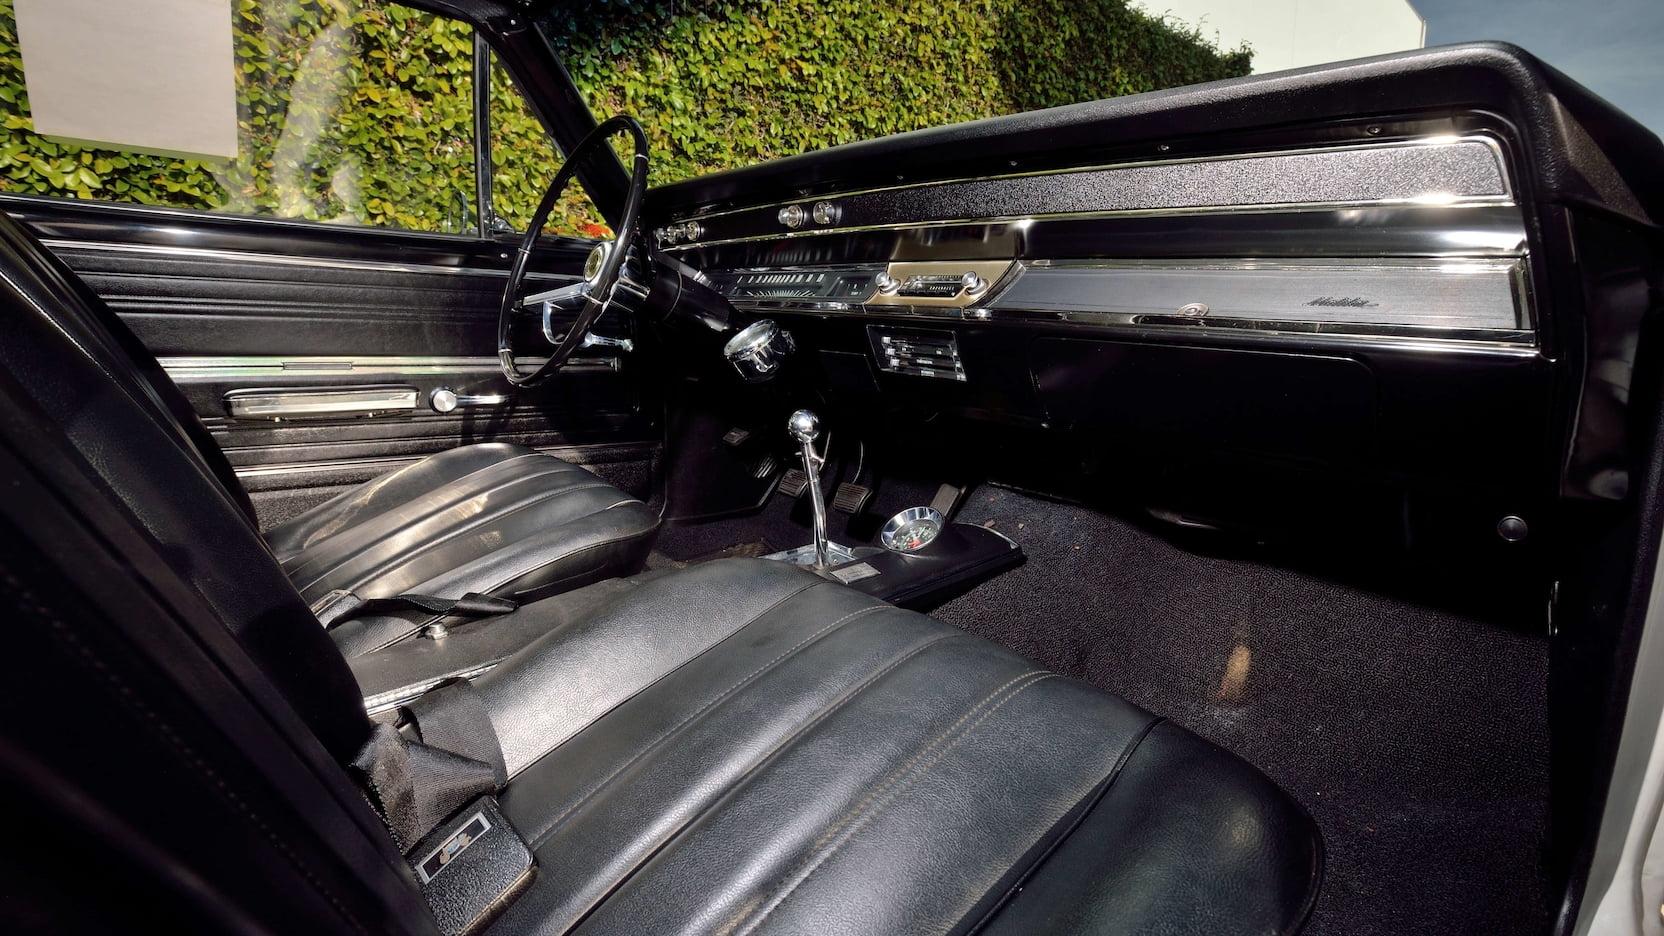 1966 Chevrolet El Camino interior passenger